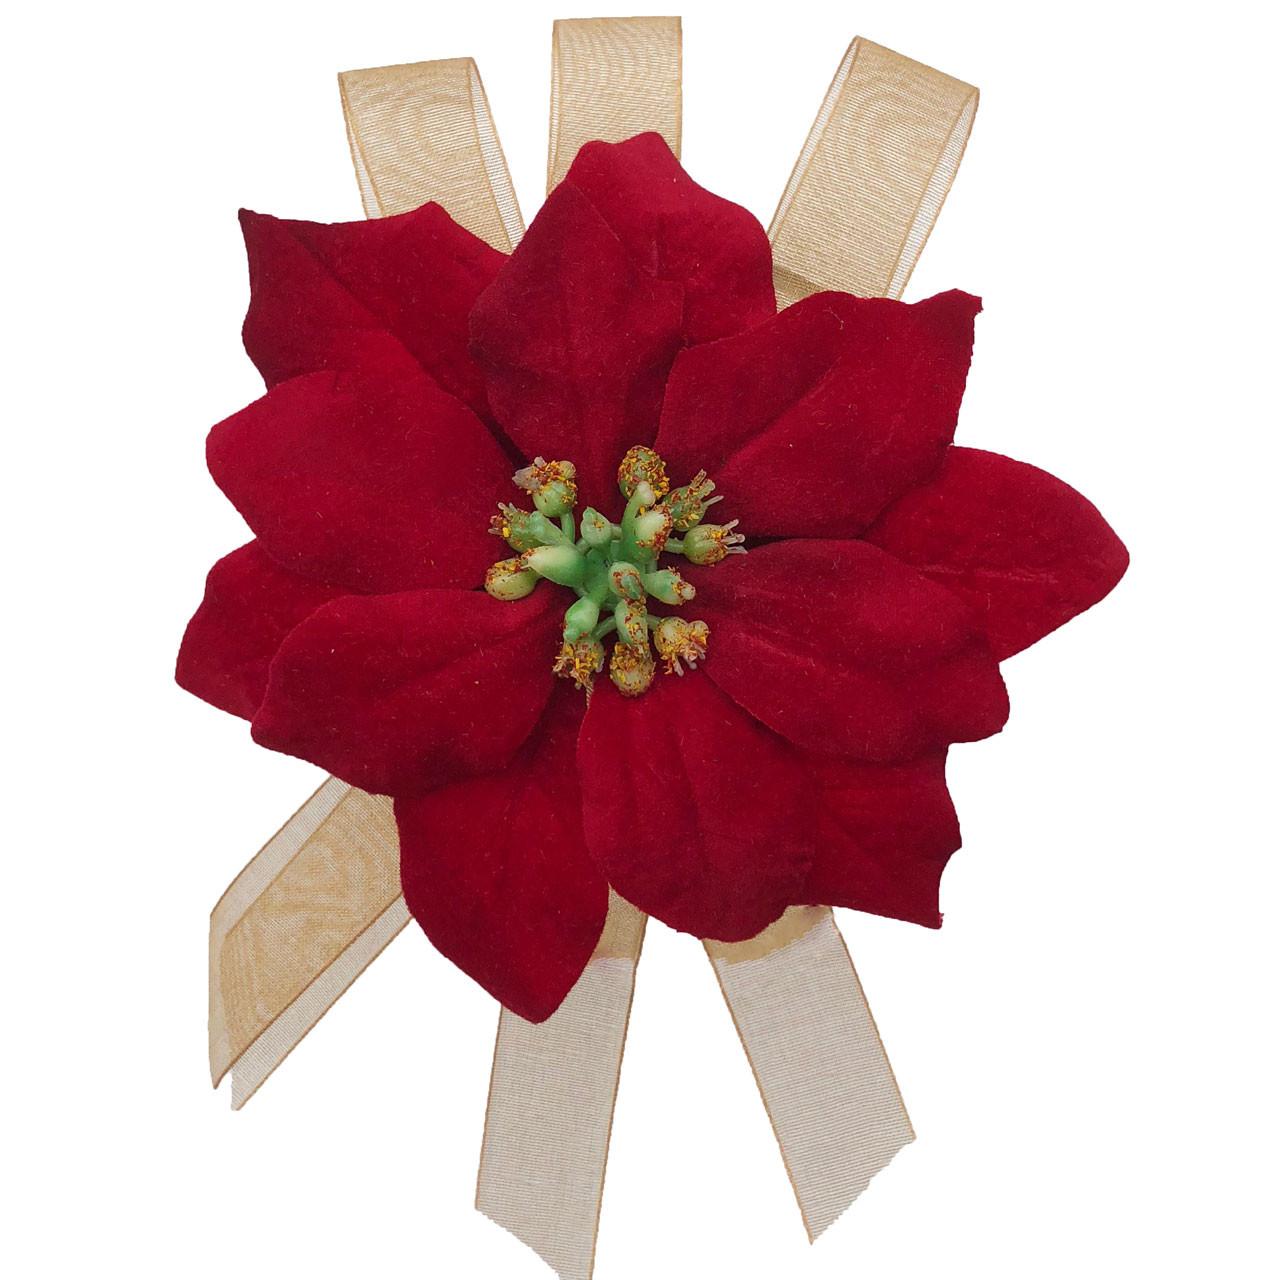 Red Christmas Poinsettia Velvet Holiday Formal Party Wedding Silk